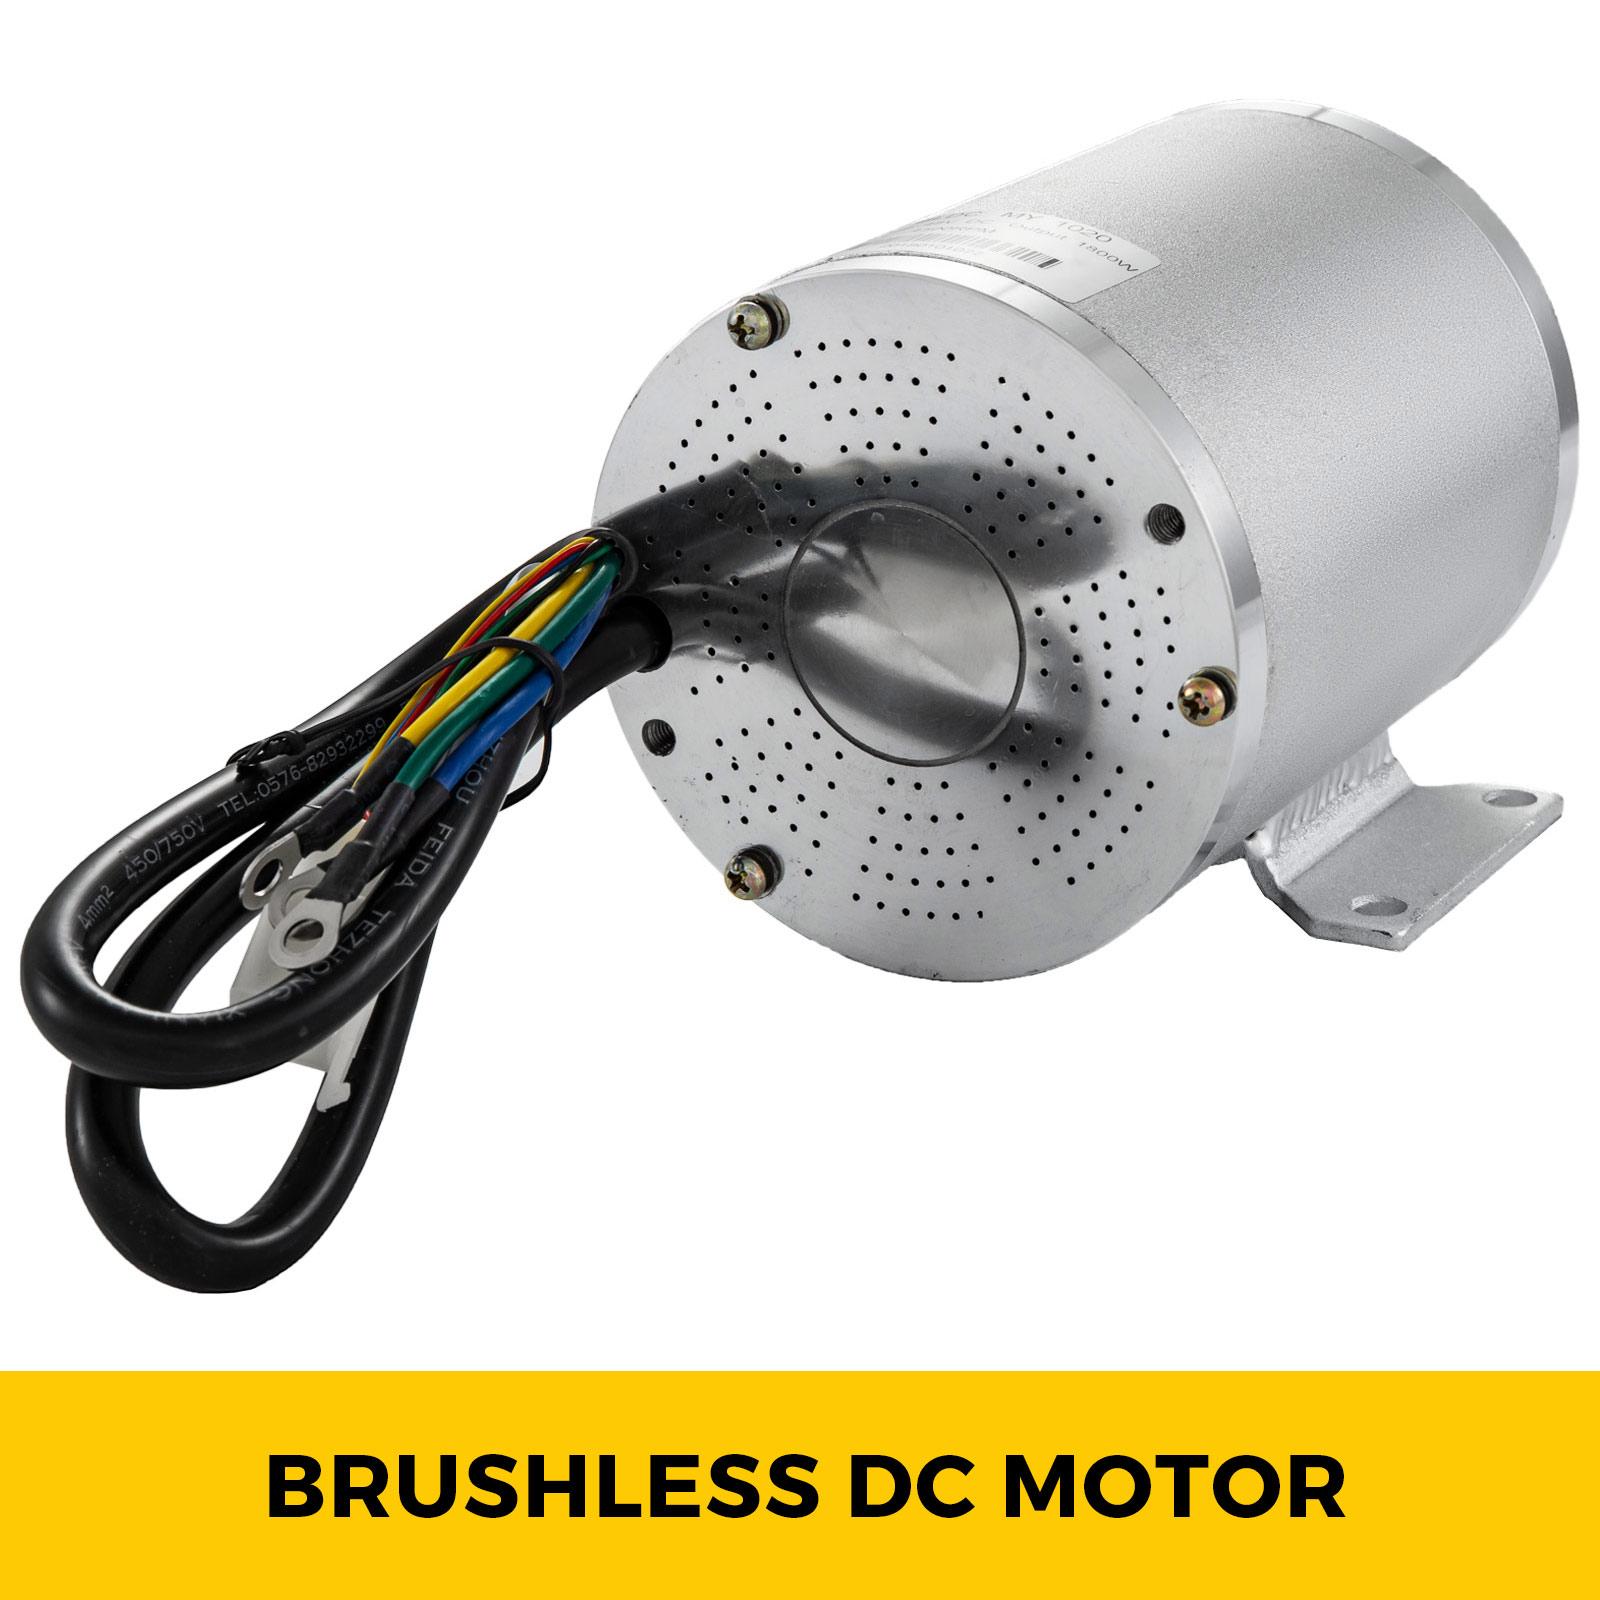 1800W-48V-DC-Brushless-Electric-Motor-Kit-f-Scooter-500-1800W-E-Bike-Go-Kart thumbnail 194